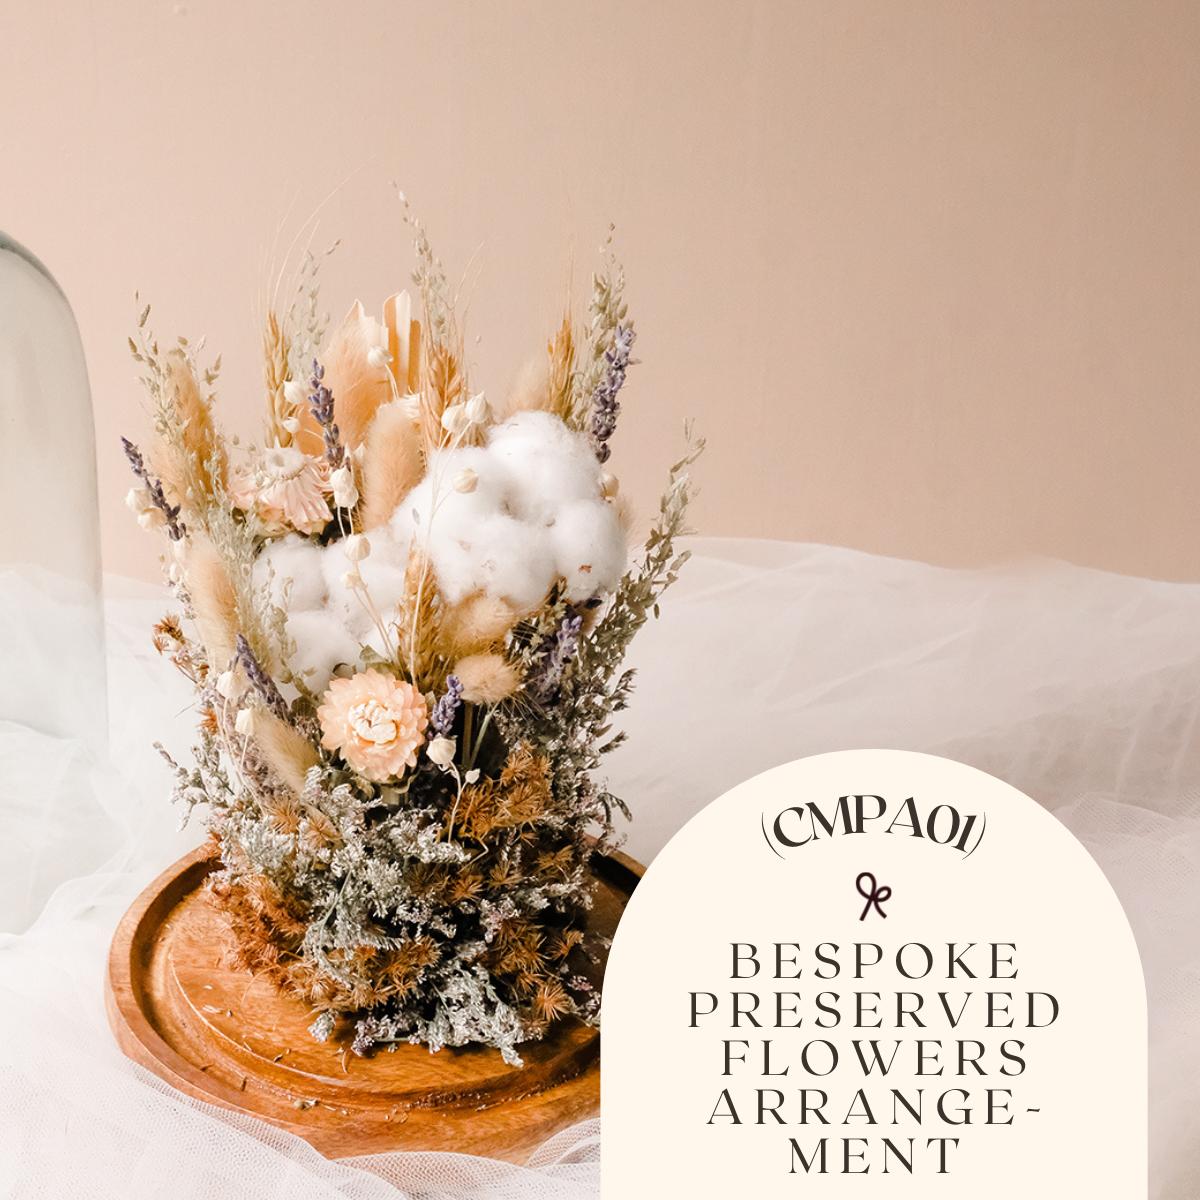 Bespoke Preserved Flowers Arrangement